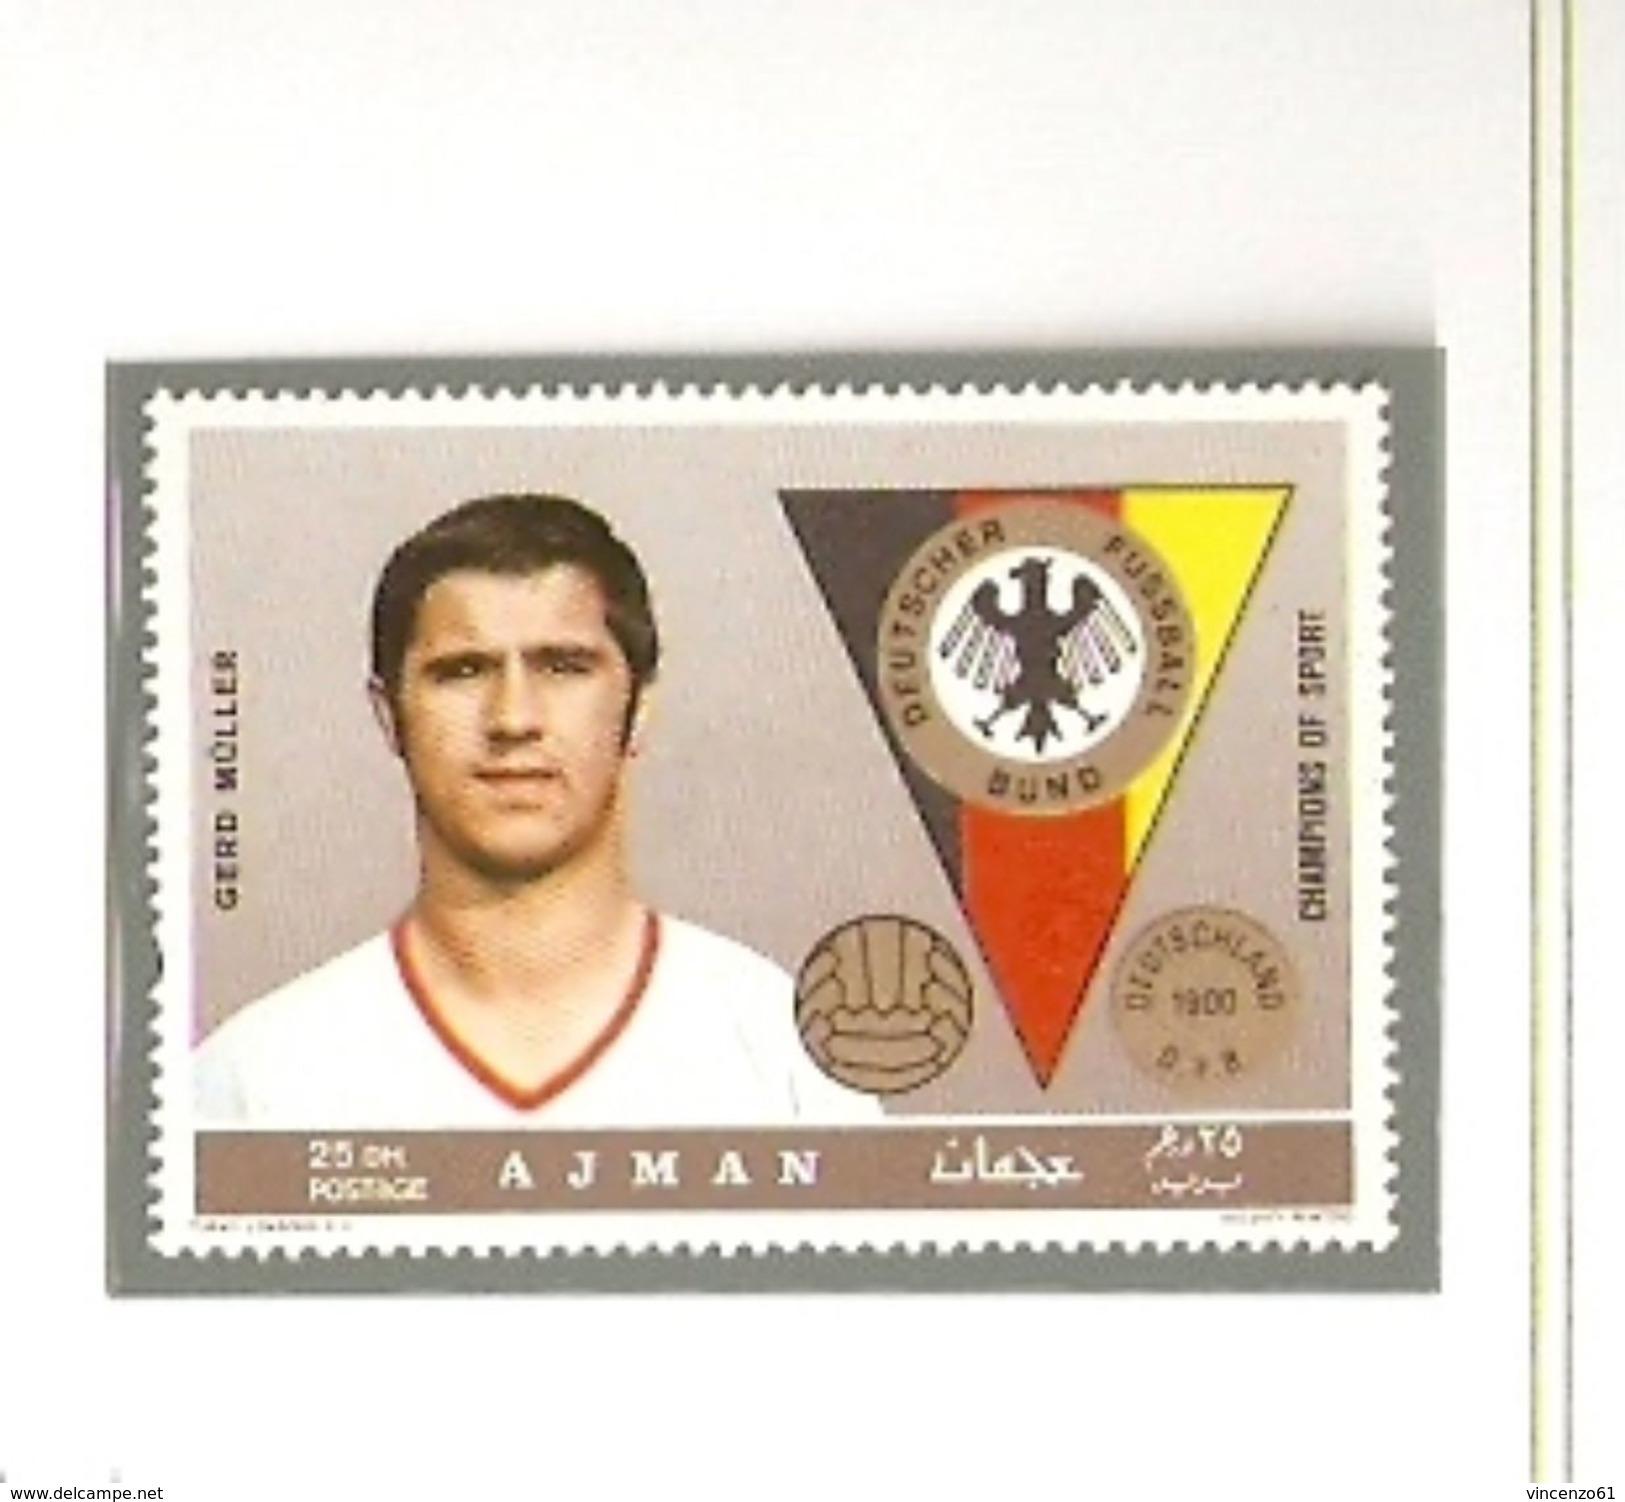 AJMAN GERMANY TEAM GEERD MULLER FIFA WORLD CUP 1974 GERMANY 1974 - Coppa Del Mondo